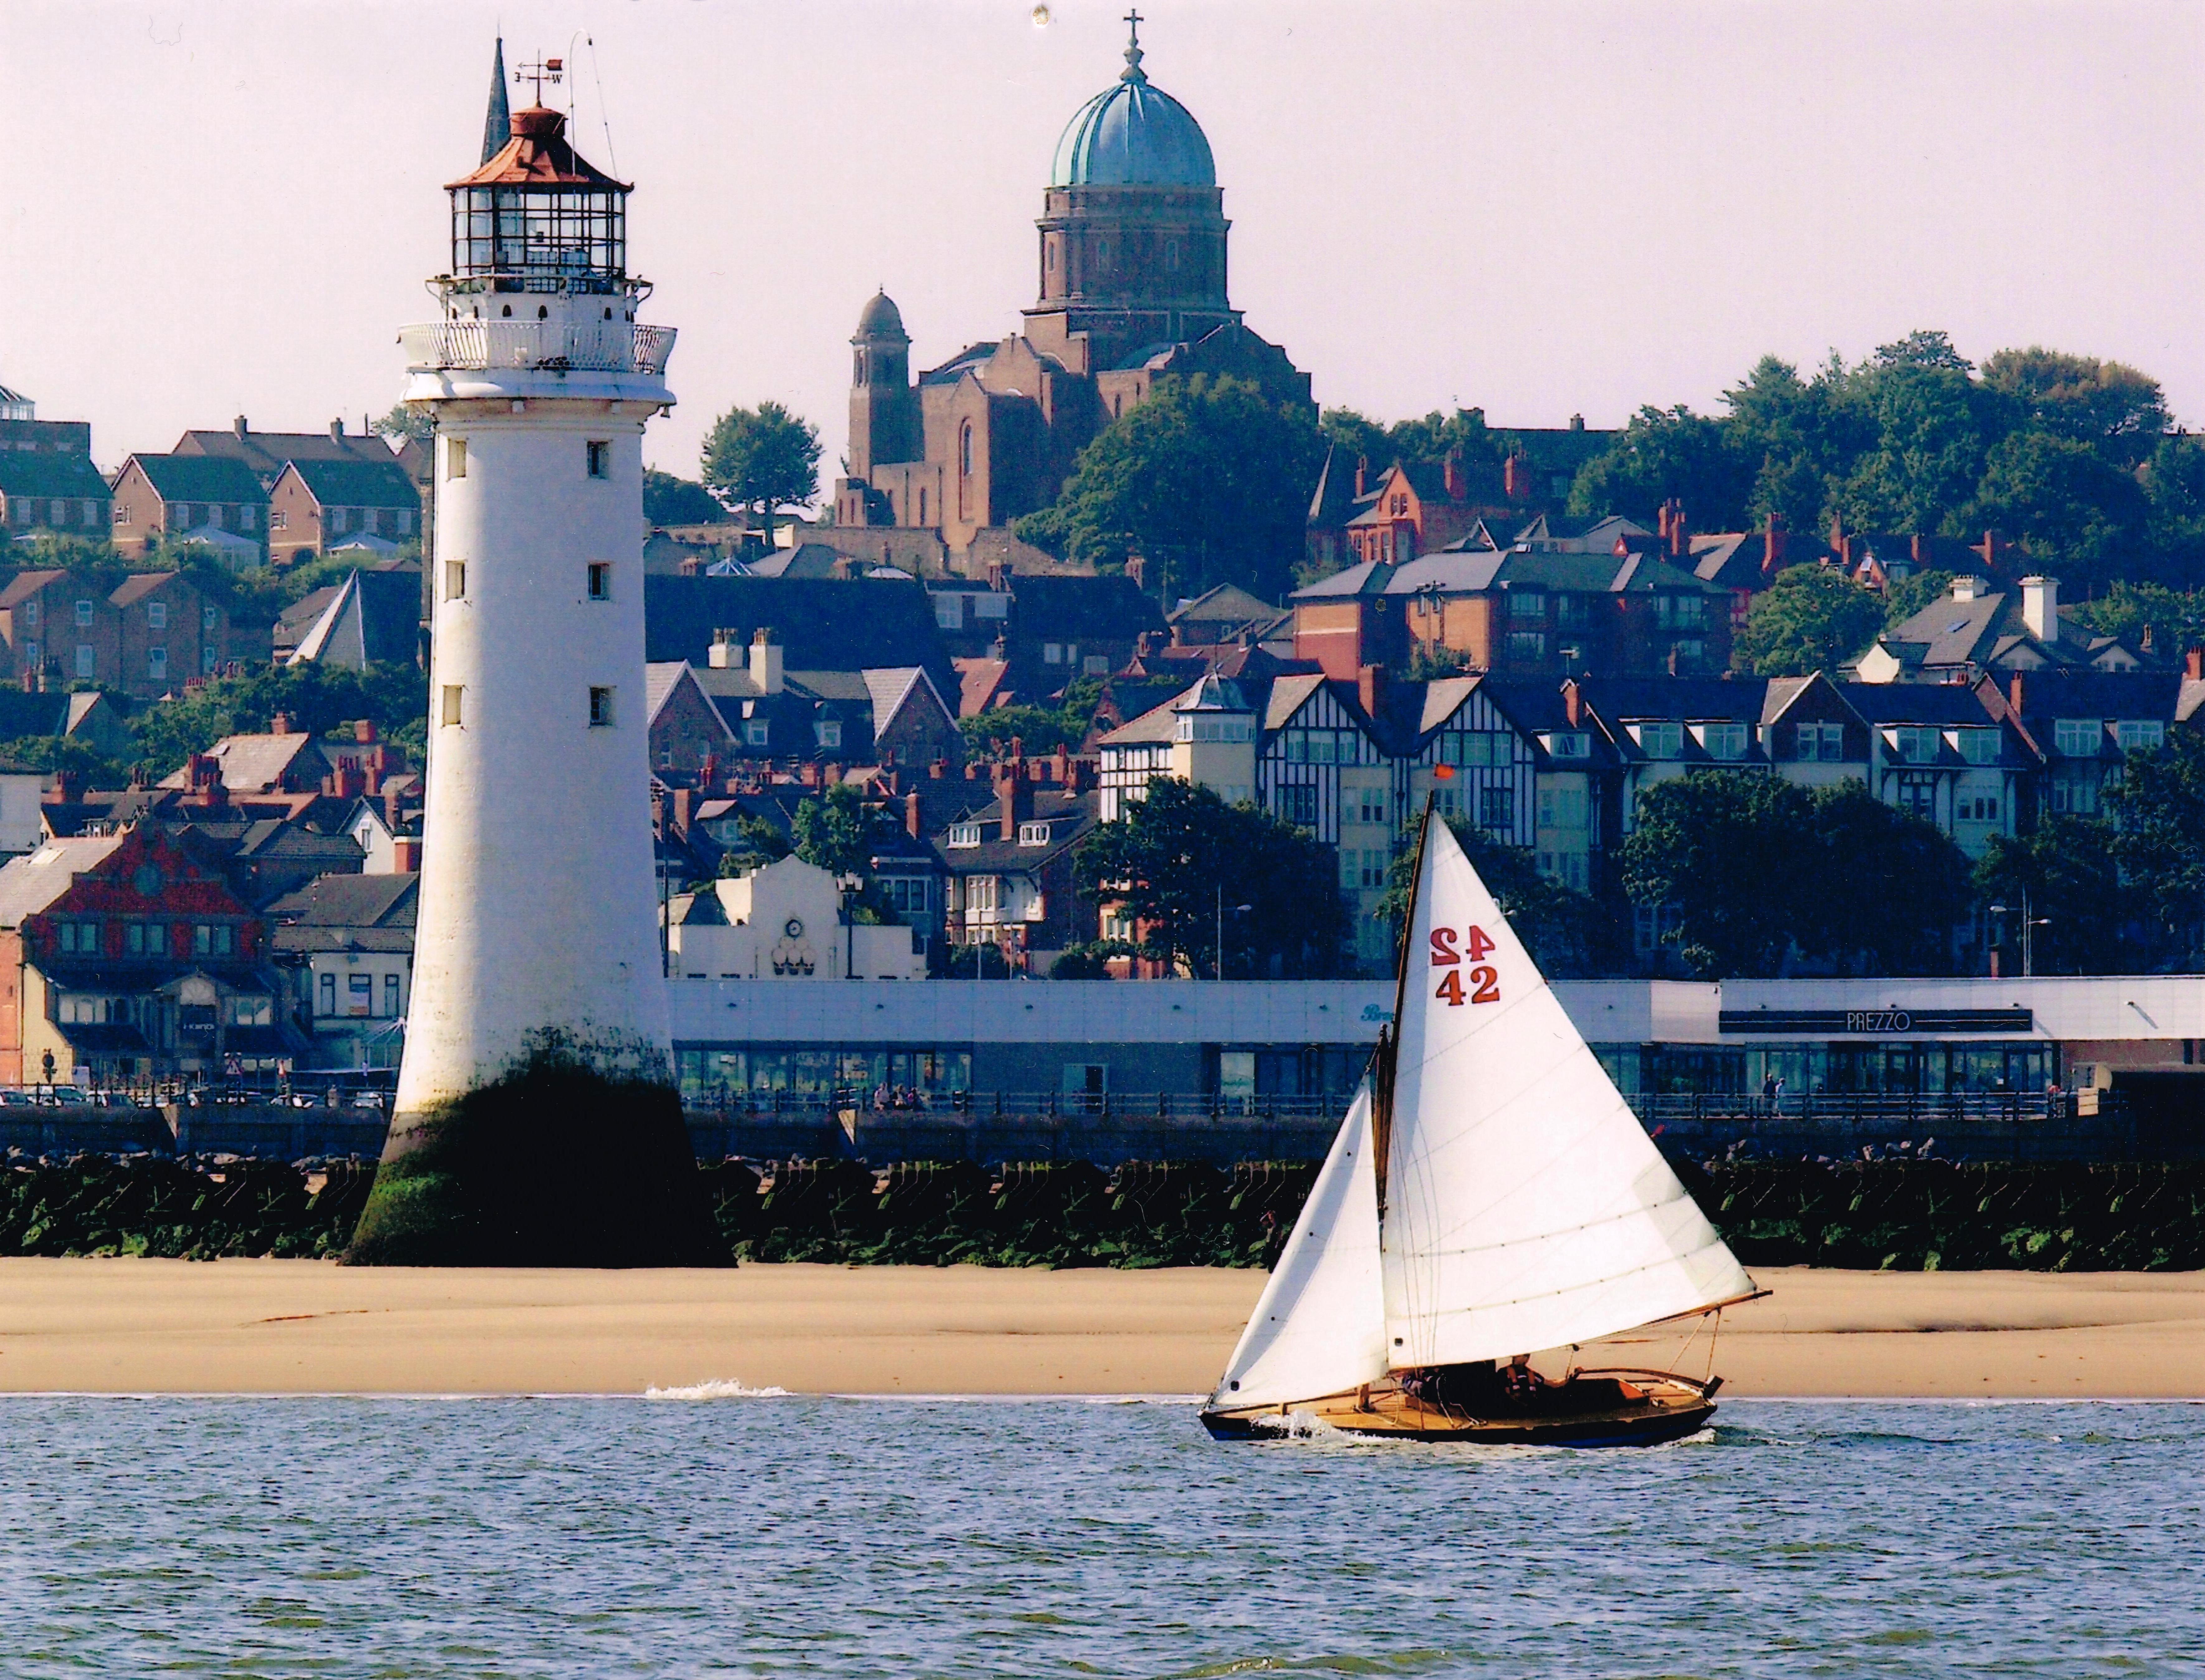 Merseyside, NEW BRIGHTON, SS Peter, Paul and Philomena (Steve Billington)